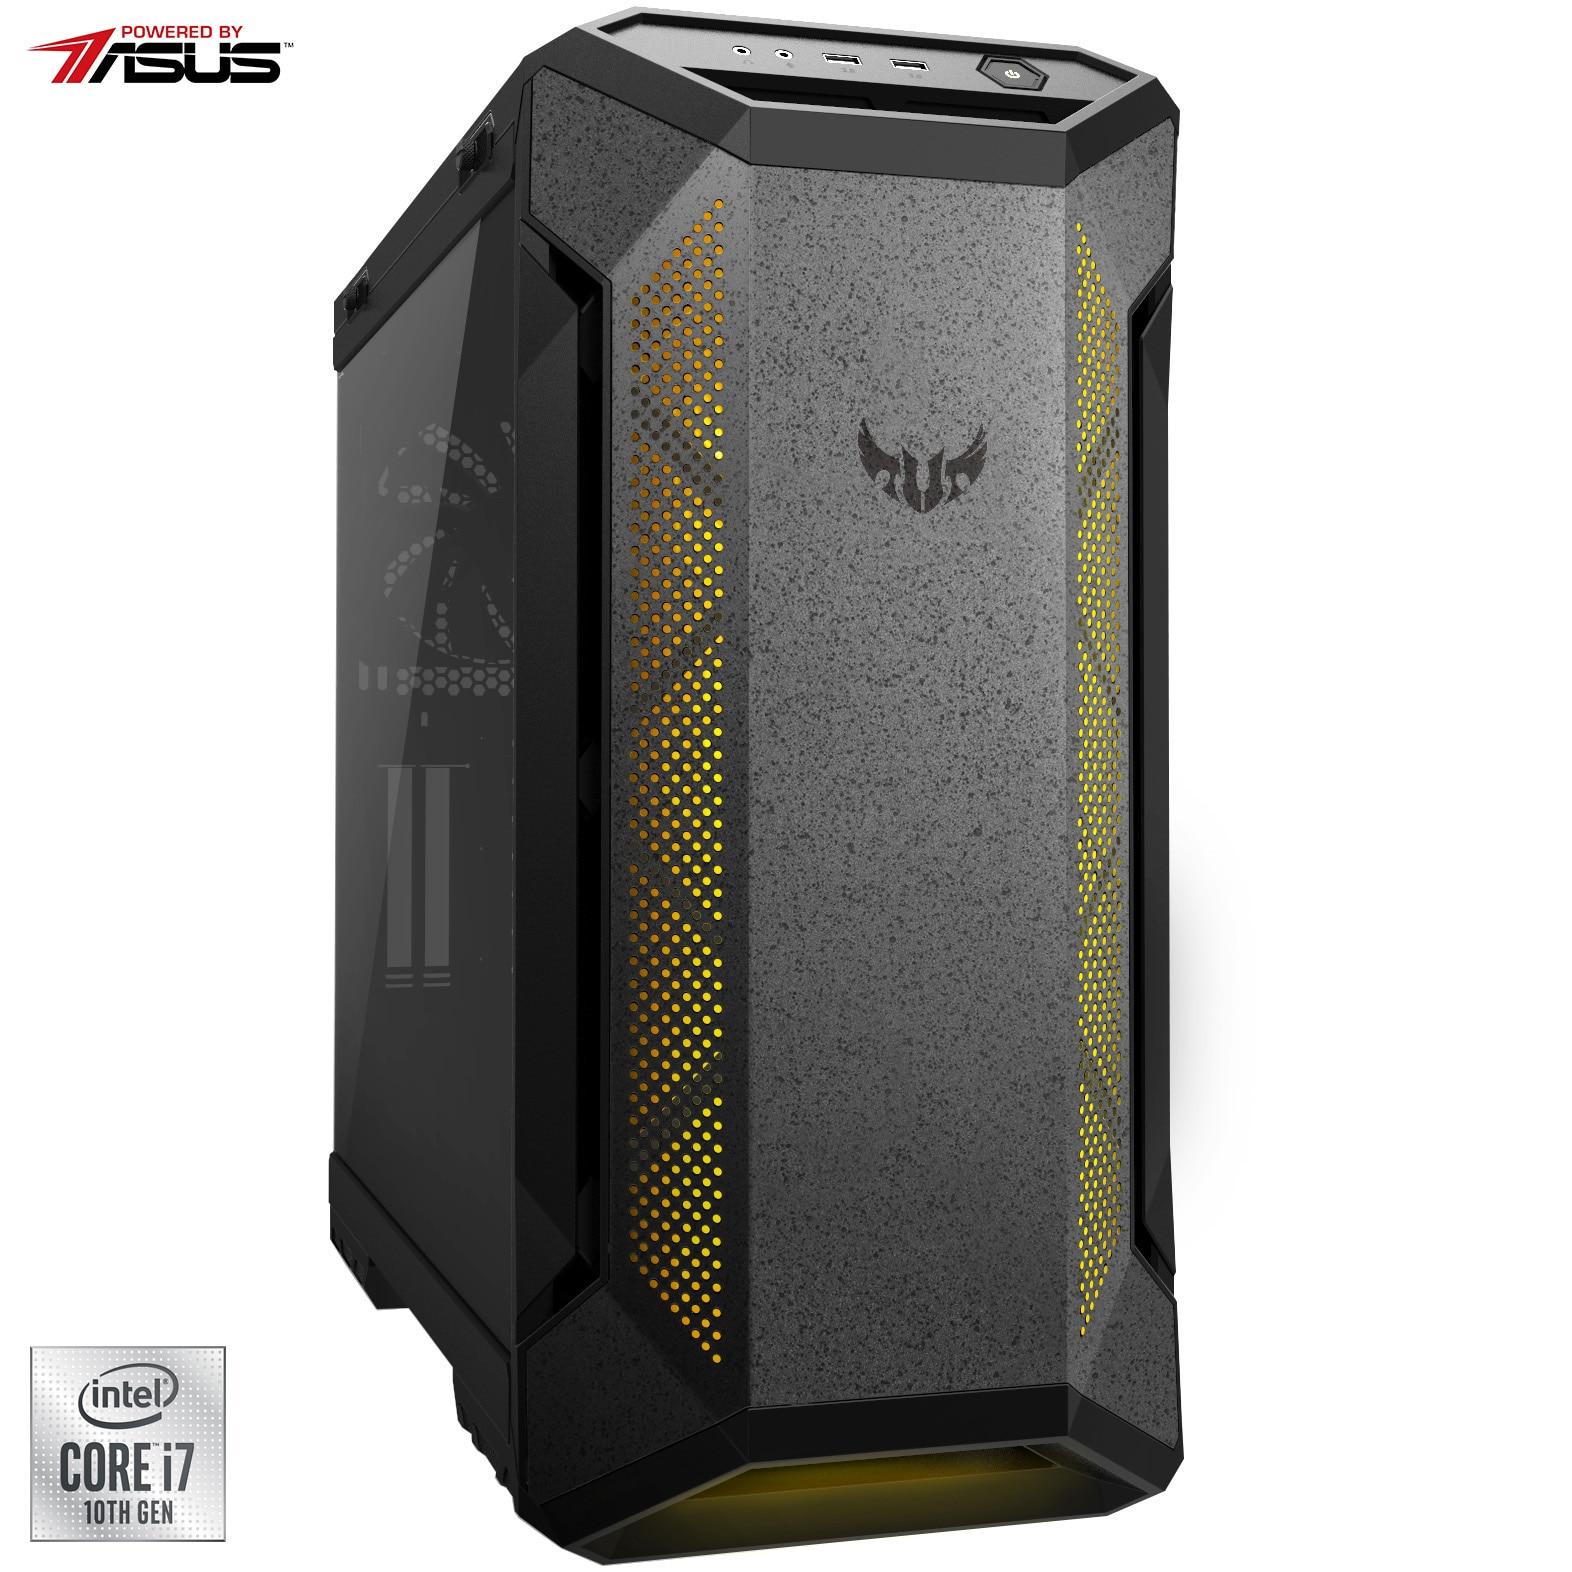 Fotografie Sistem Desktop PC Gaming Serioux Powered by ASUS cu procesor Intel® Core™ i7-10700K pana la 5.10GHz, 32GB DDR4, 1TB SSD M.2 PCIe + 2TB HDD, GeForce® GTX 2080 Ti 11GB GDDR6